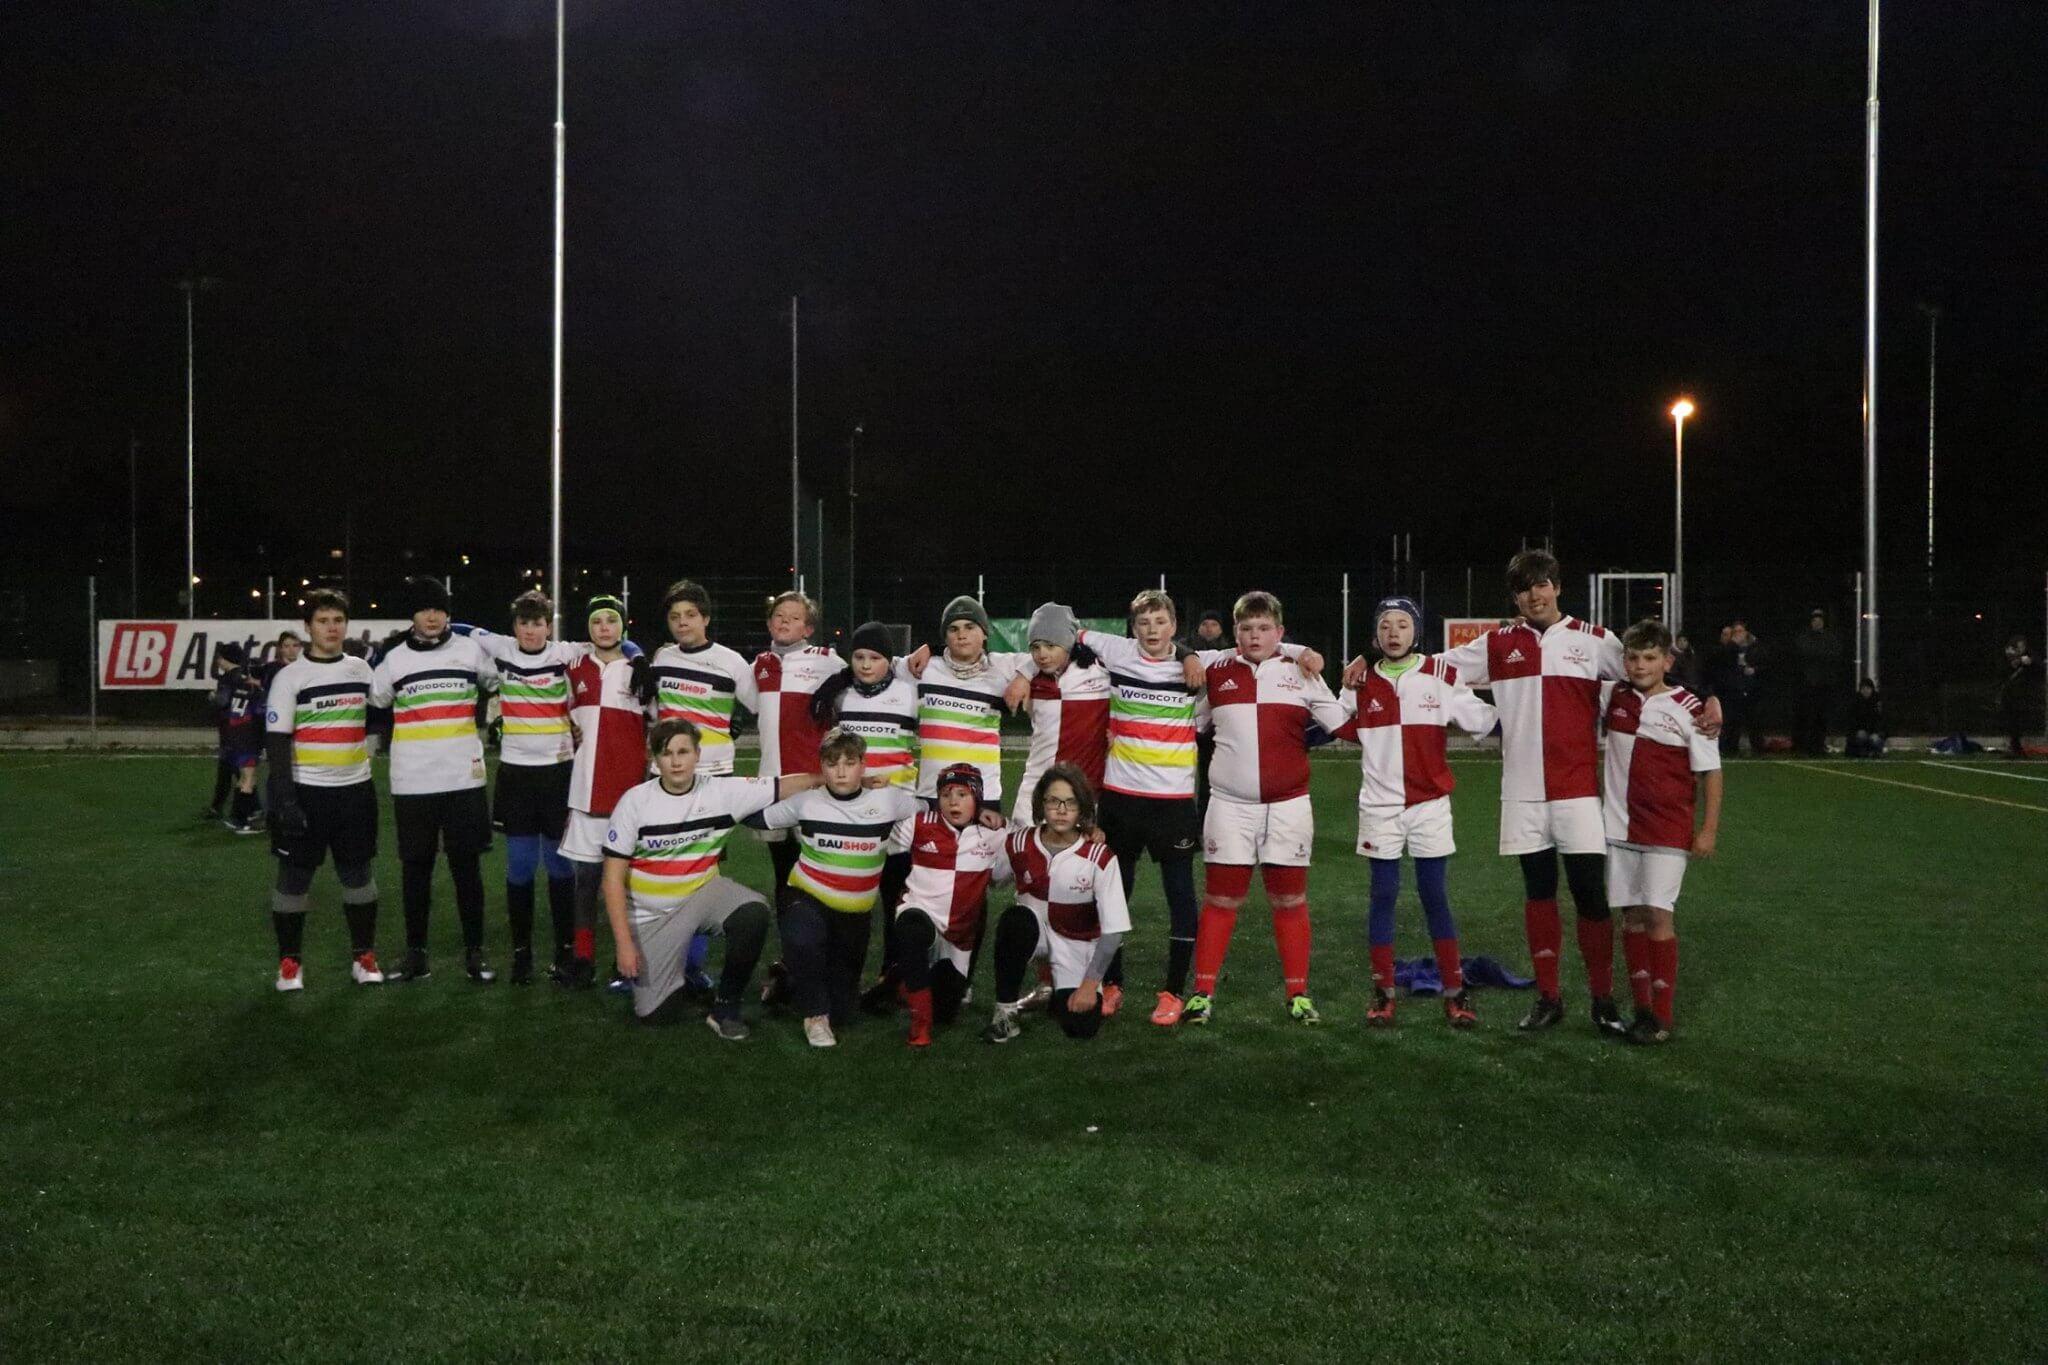 Winter rugby 7s U14